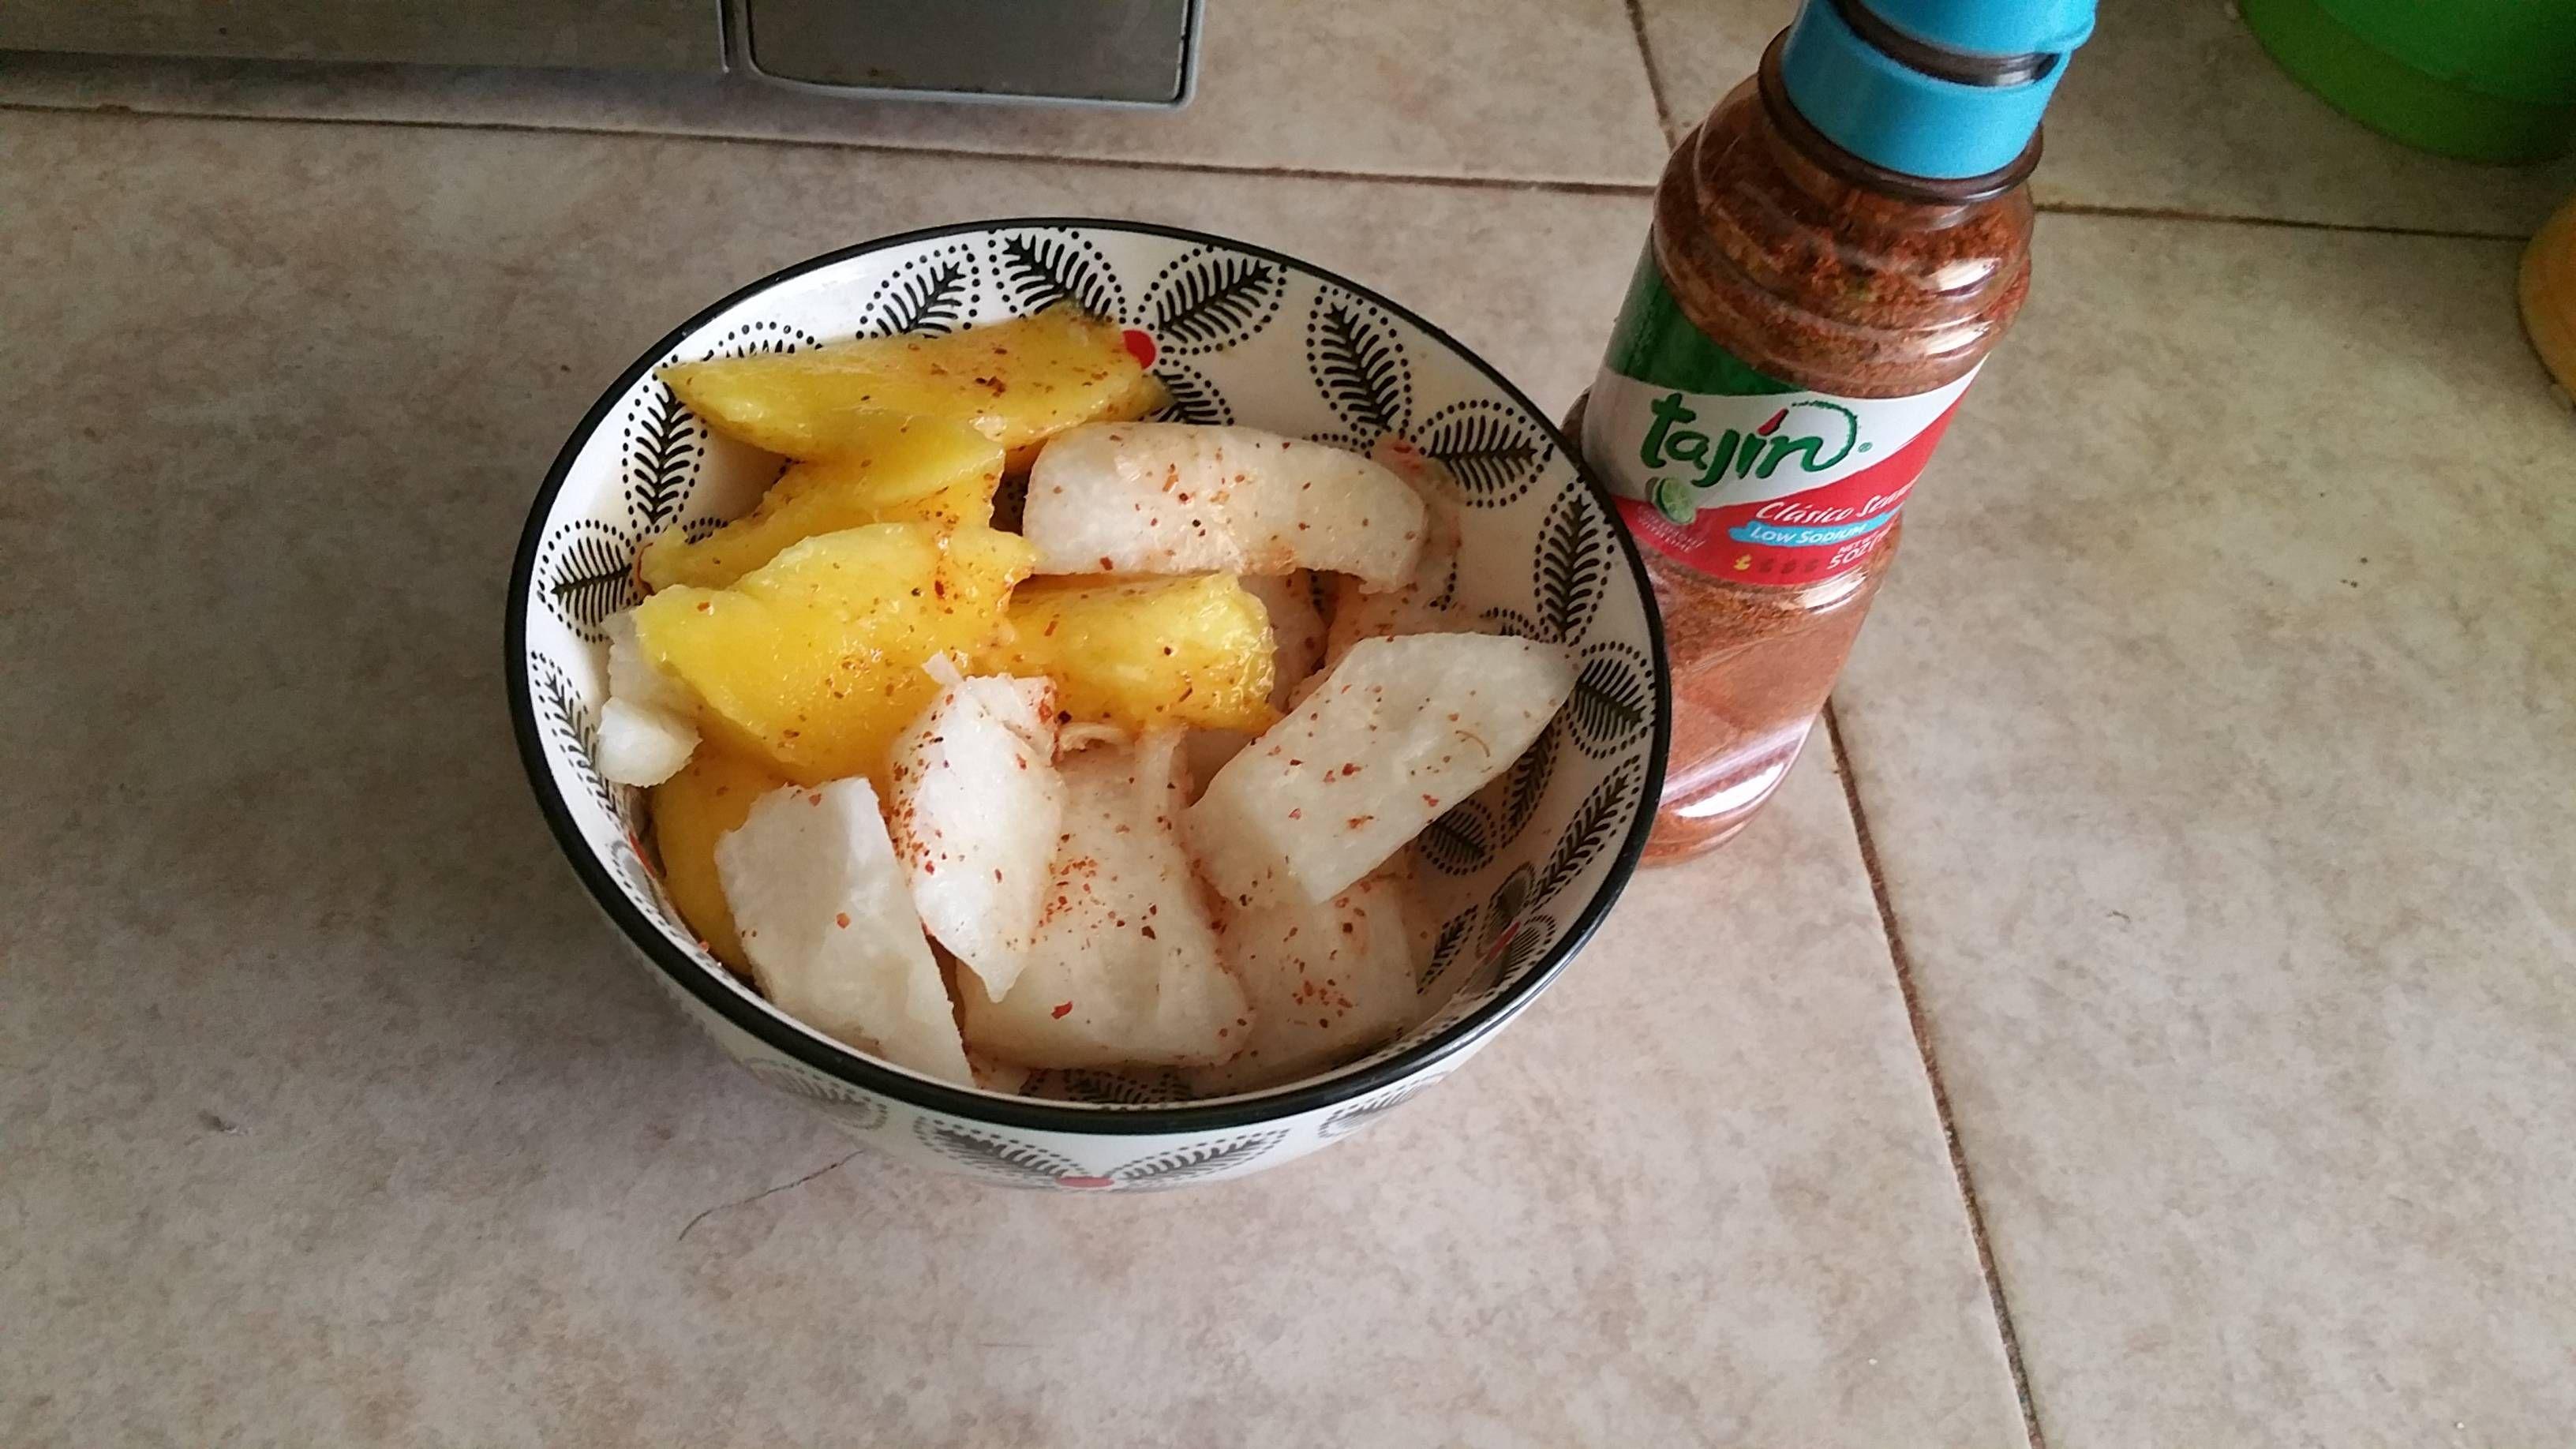 Jicama Mango And Tajin 130 Calories Goodnutrition Physicalactivity Goodfood Vegetables Juiceplus Healthymeal Healthyf Healthy Snacks Jicama Nutrition